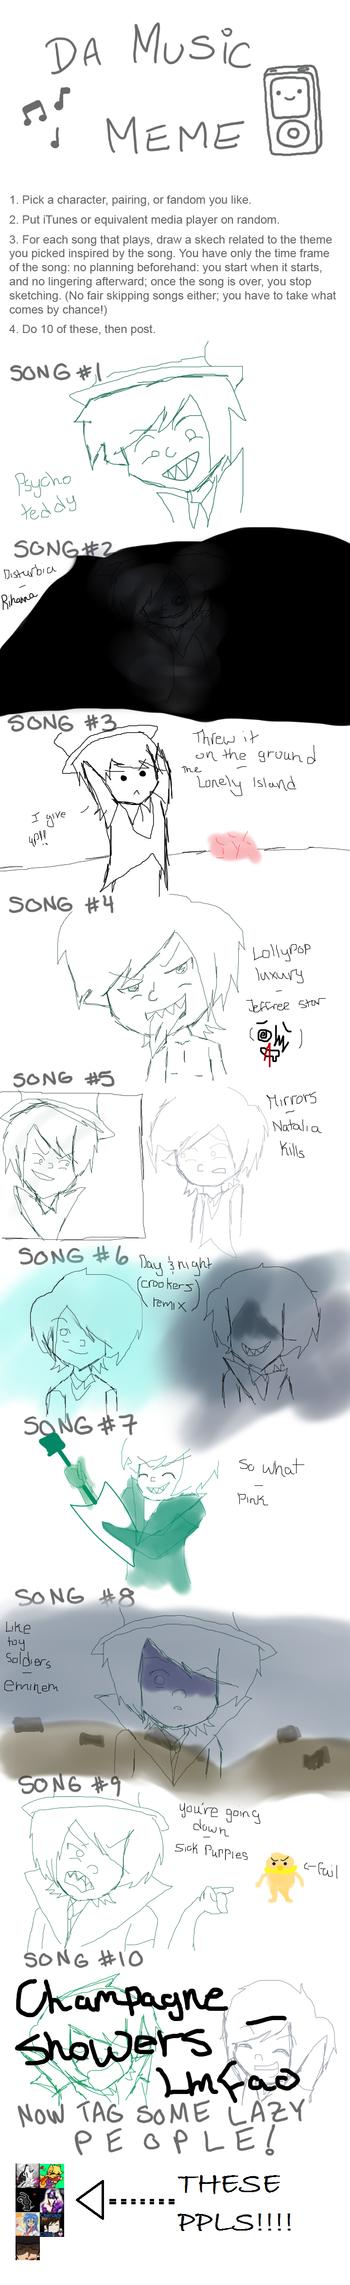 lorax music meme by Abundant-Chaos